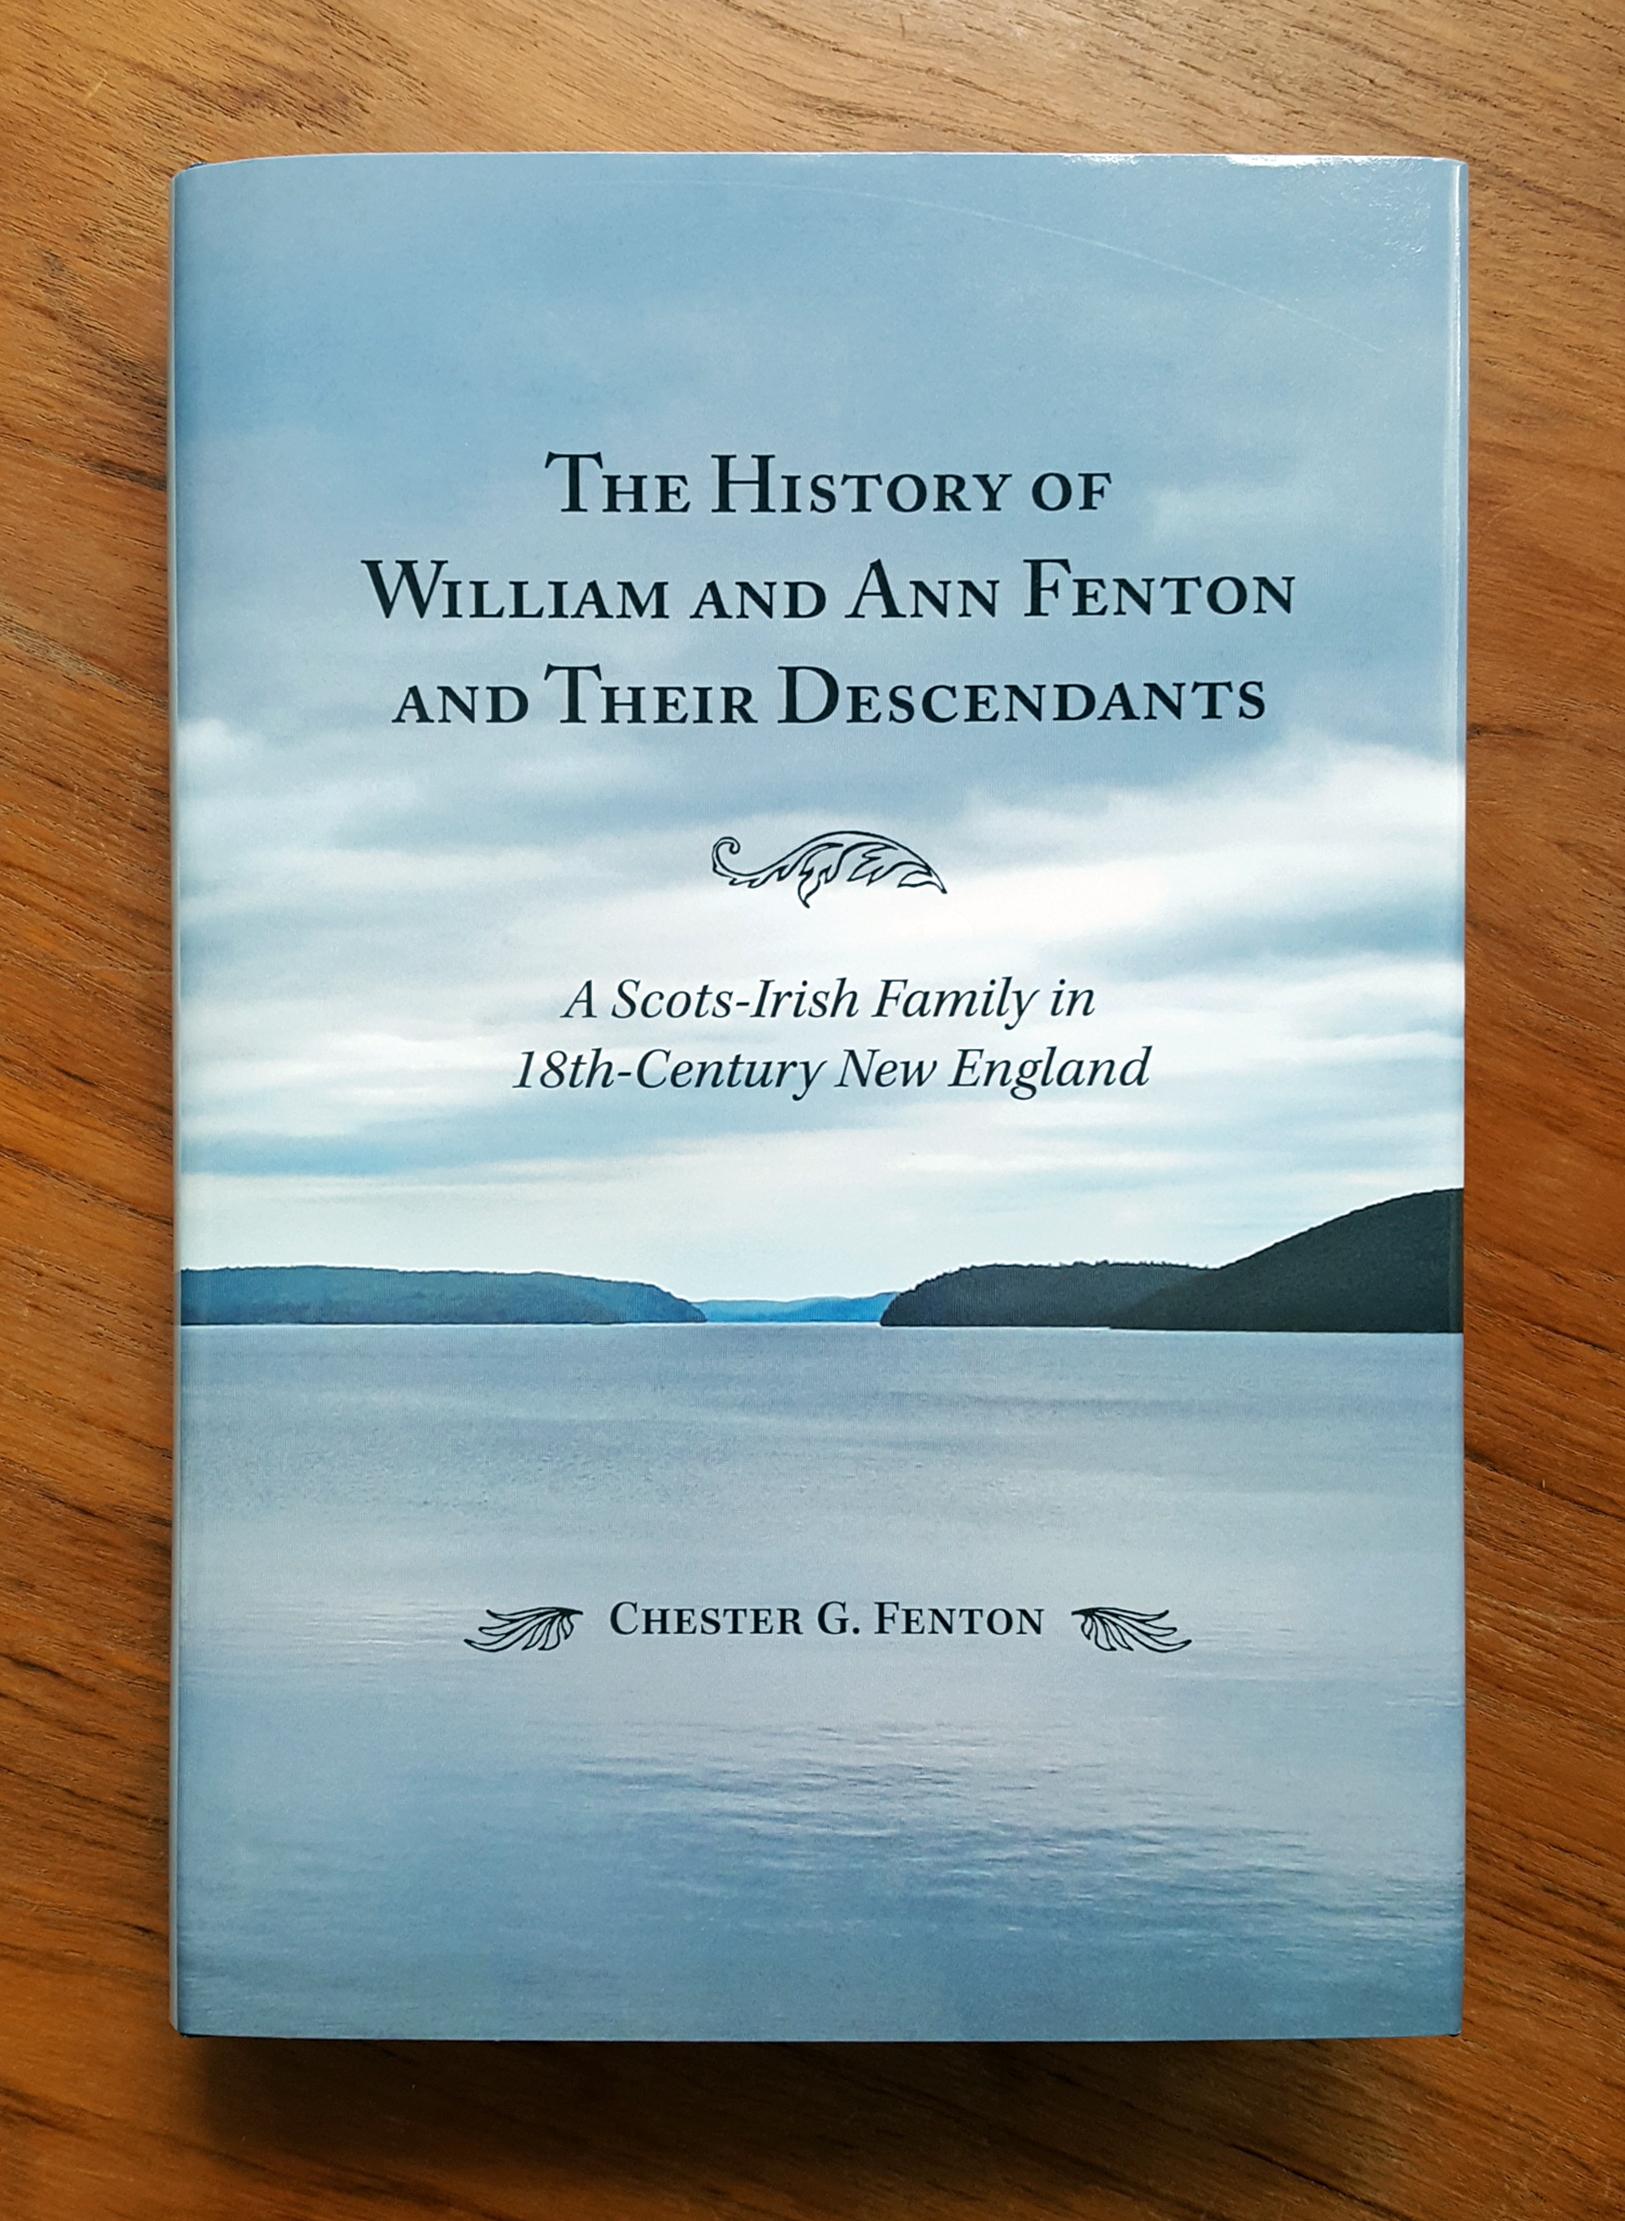 Fenton book 2018.jpg